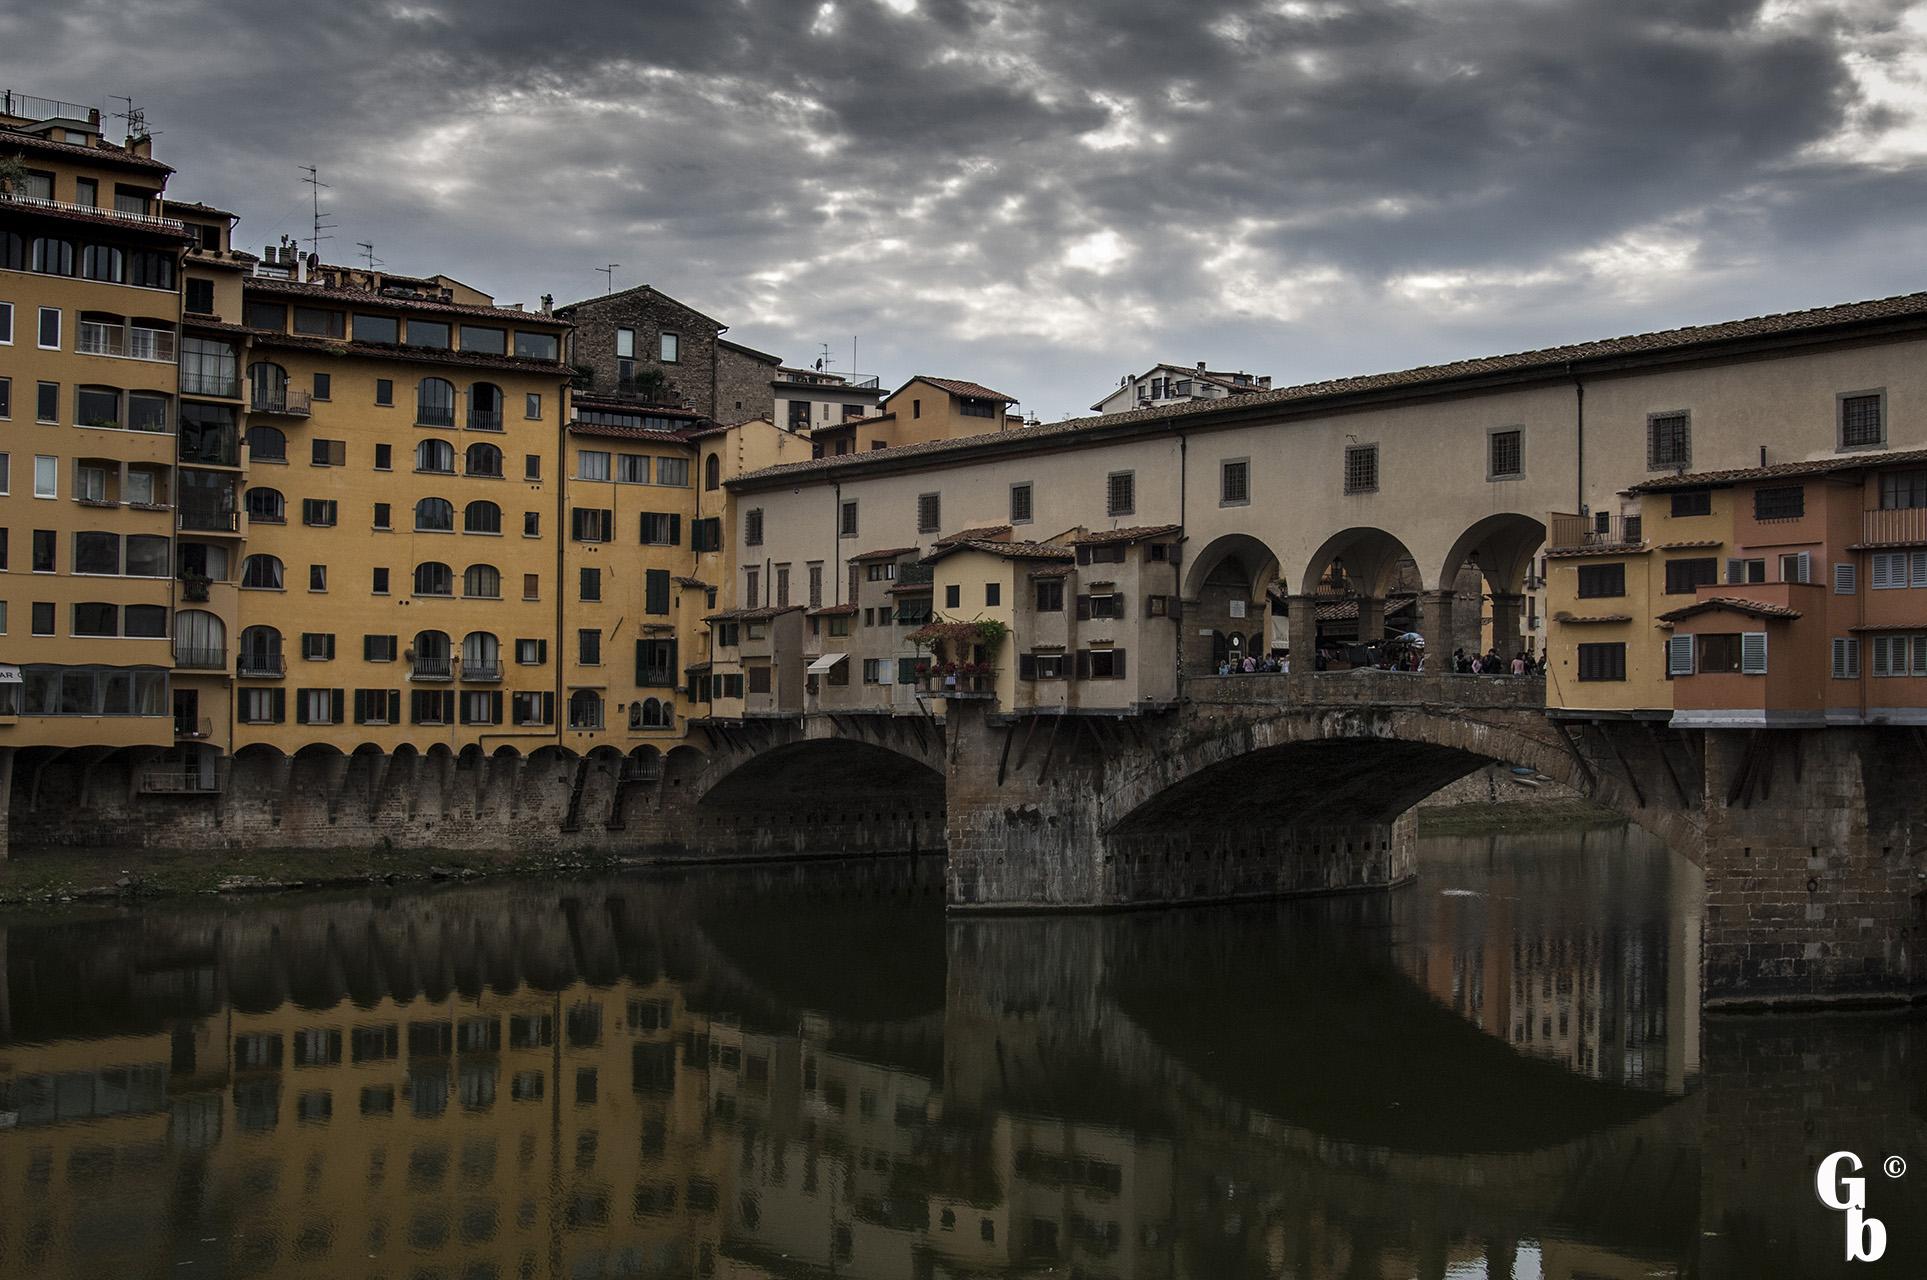 Arno...